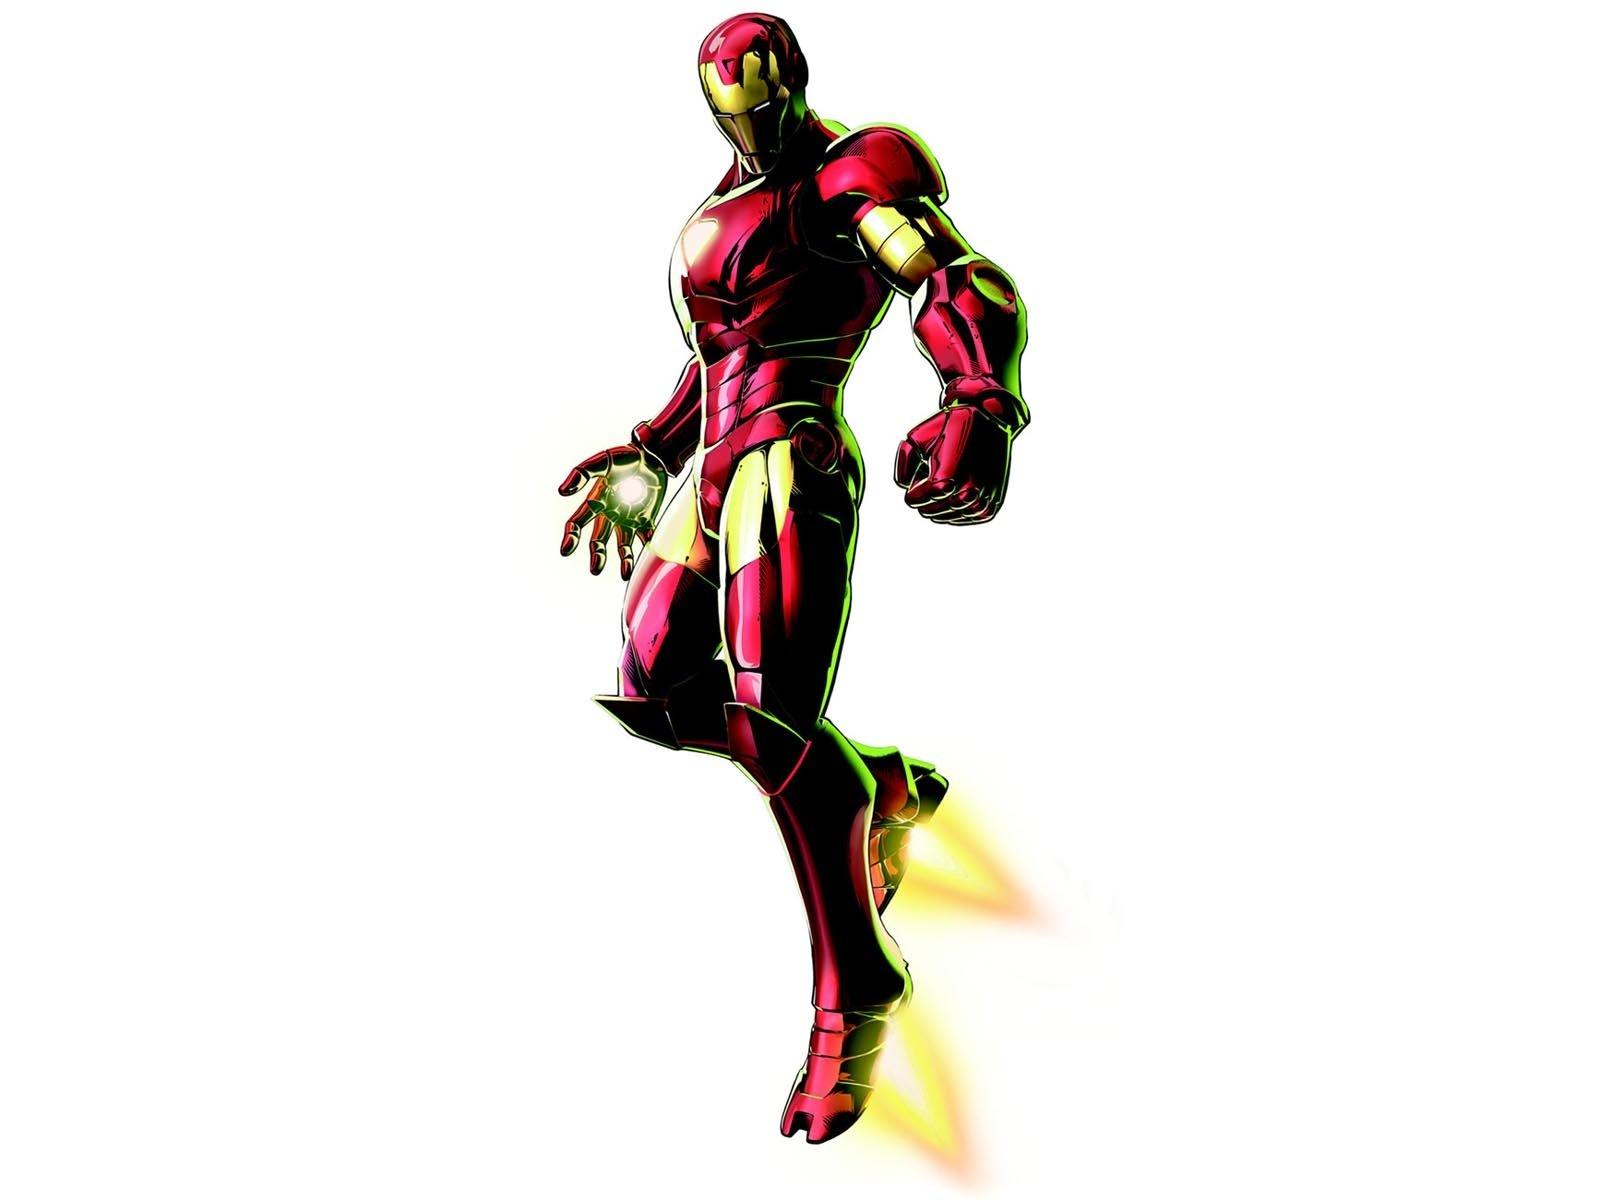 Iron man wallpaper and background image 1600x1200 id 98519 - Iron man cartoon download ...